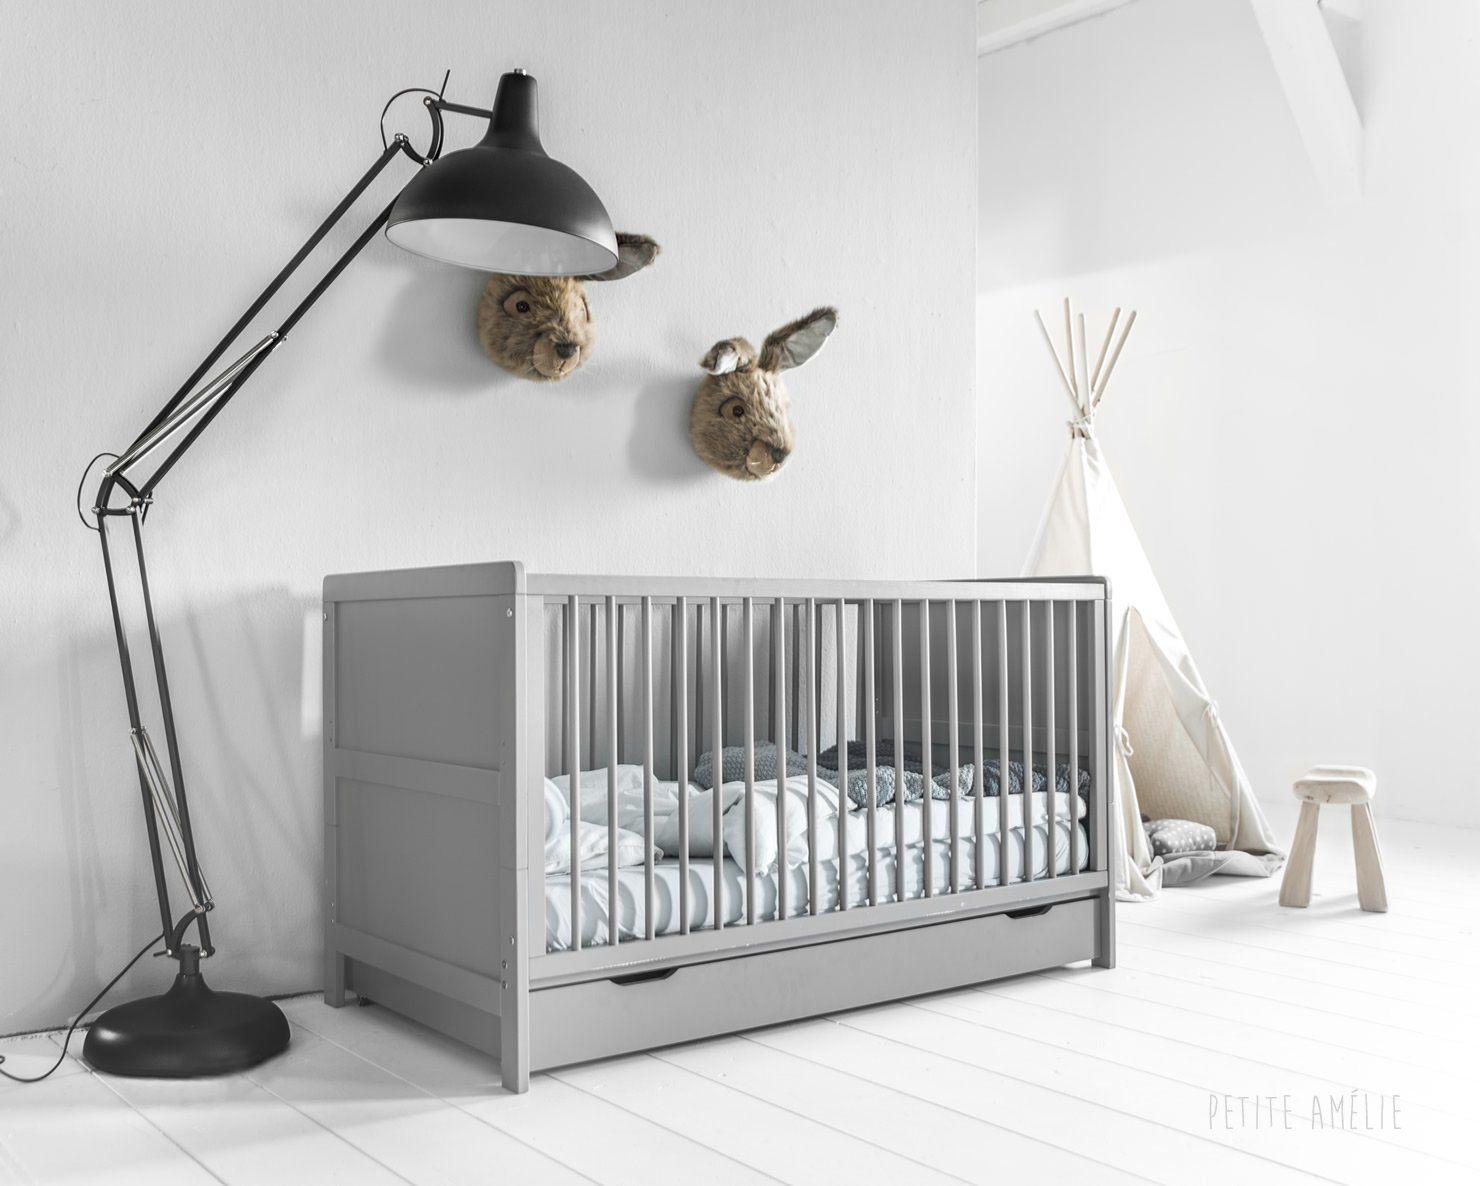 Petite Amelie Lit Evolutif Bebe Et Enfant Lit Bebe Chambre Bebe